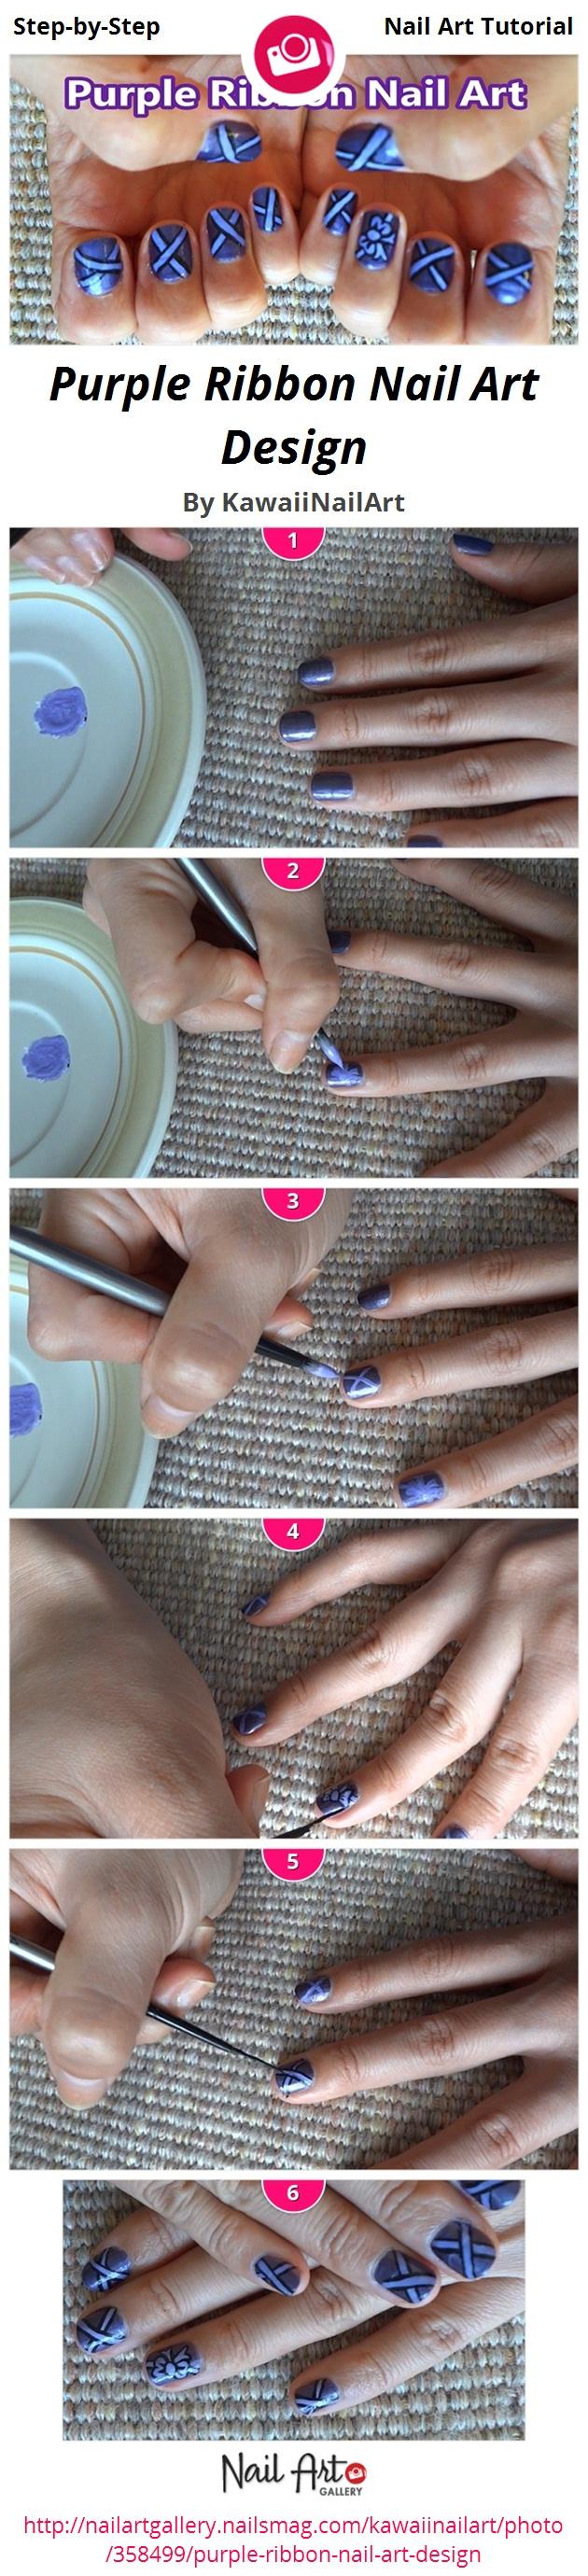 Purple Ribbon Nail Art Design - Nail Art Gallery